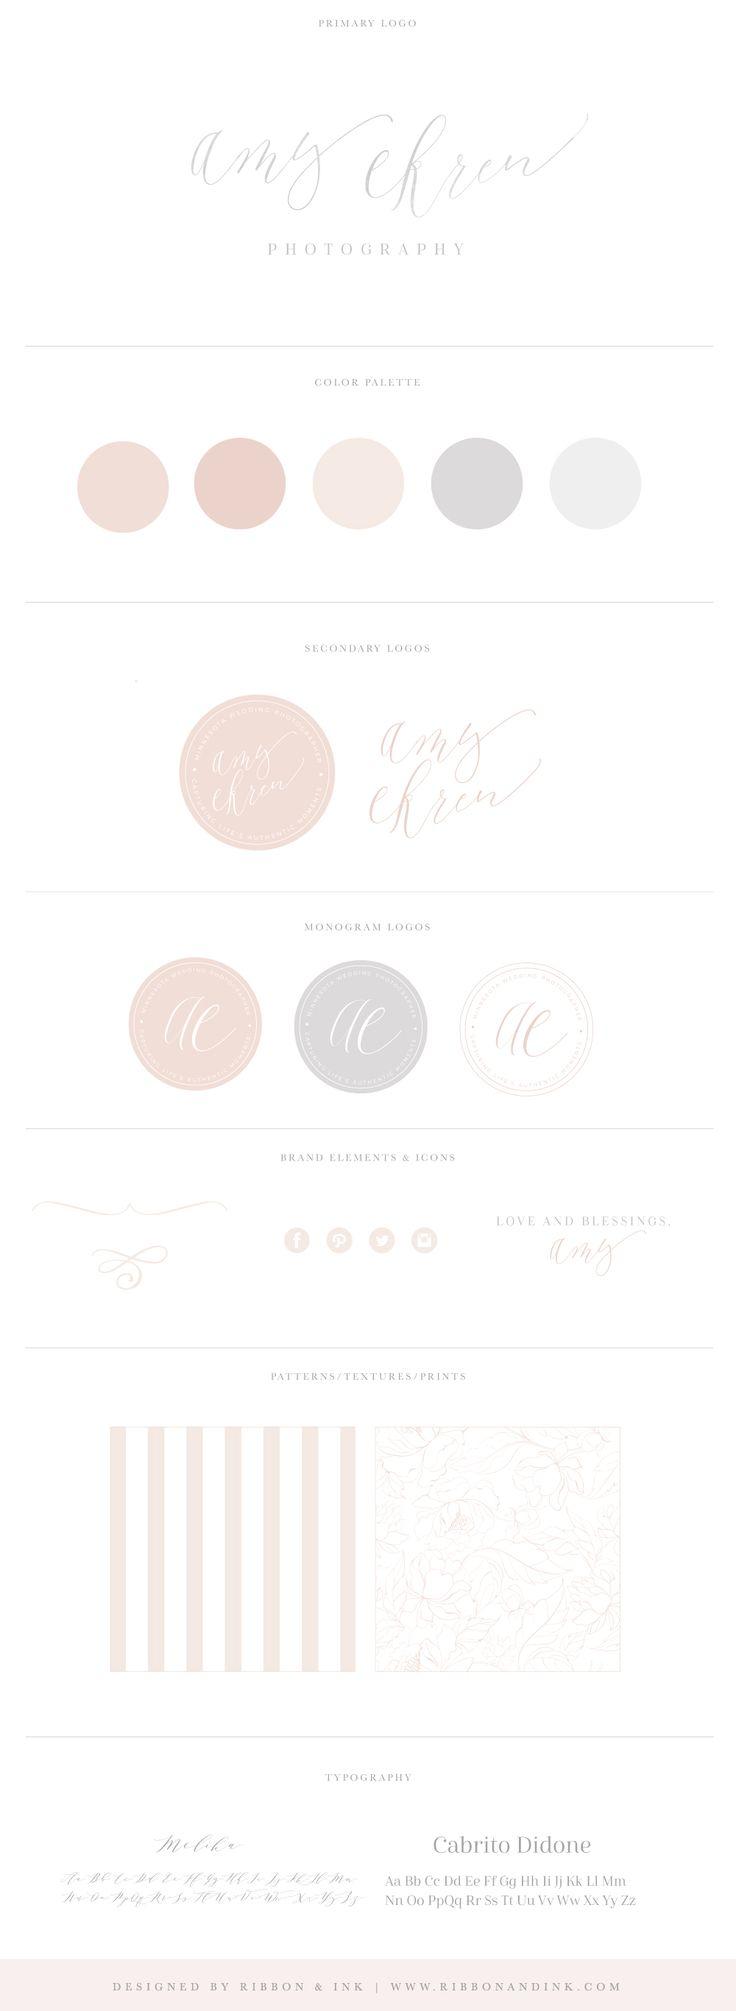 Branding / Web design / website / photographer website / custom website / website ideas/ website inspiration / Brand board / brand design / custom logo / photographer brand / photographer logo / color palette / logo design